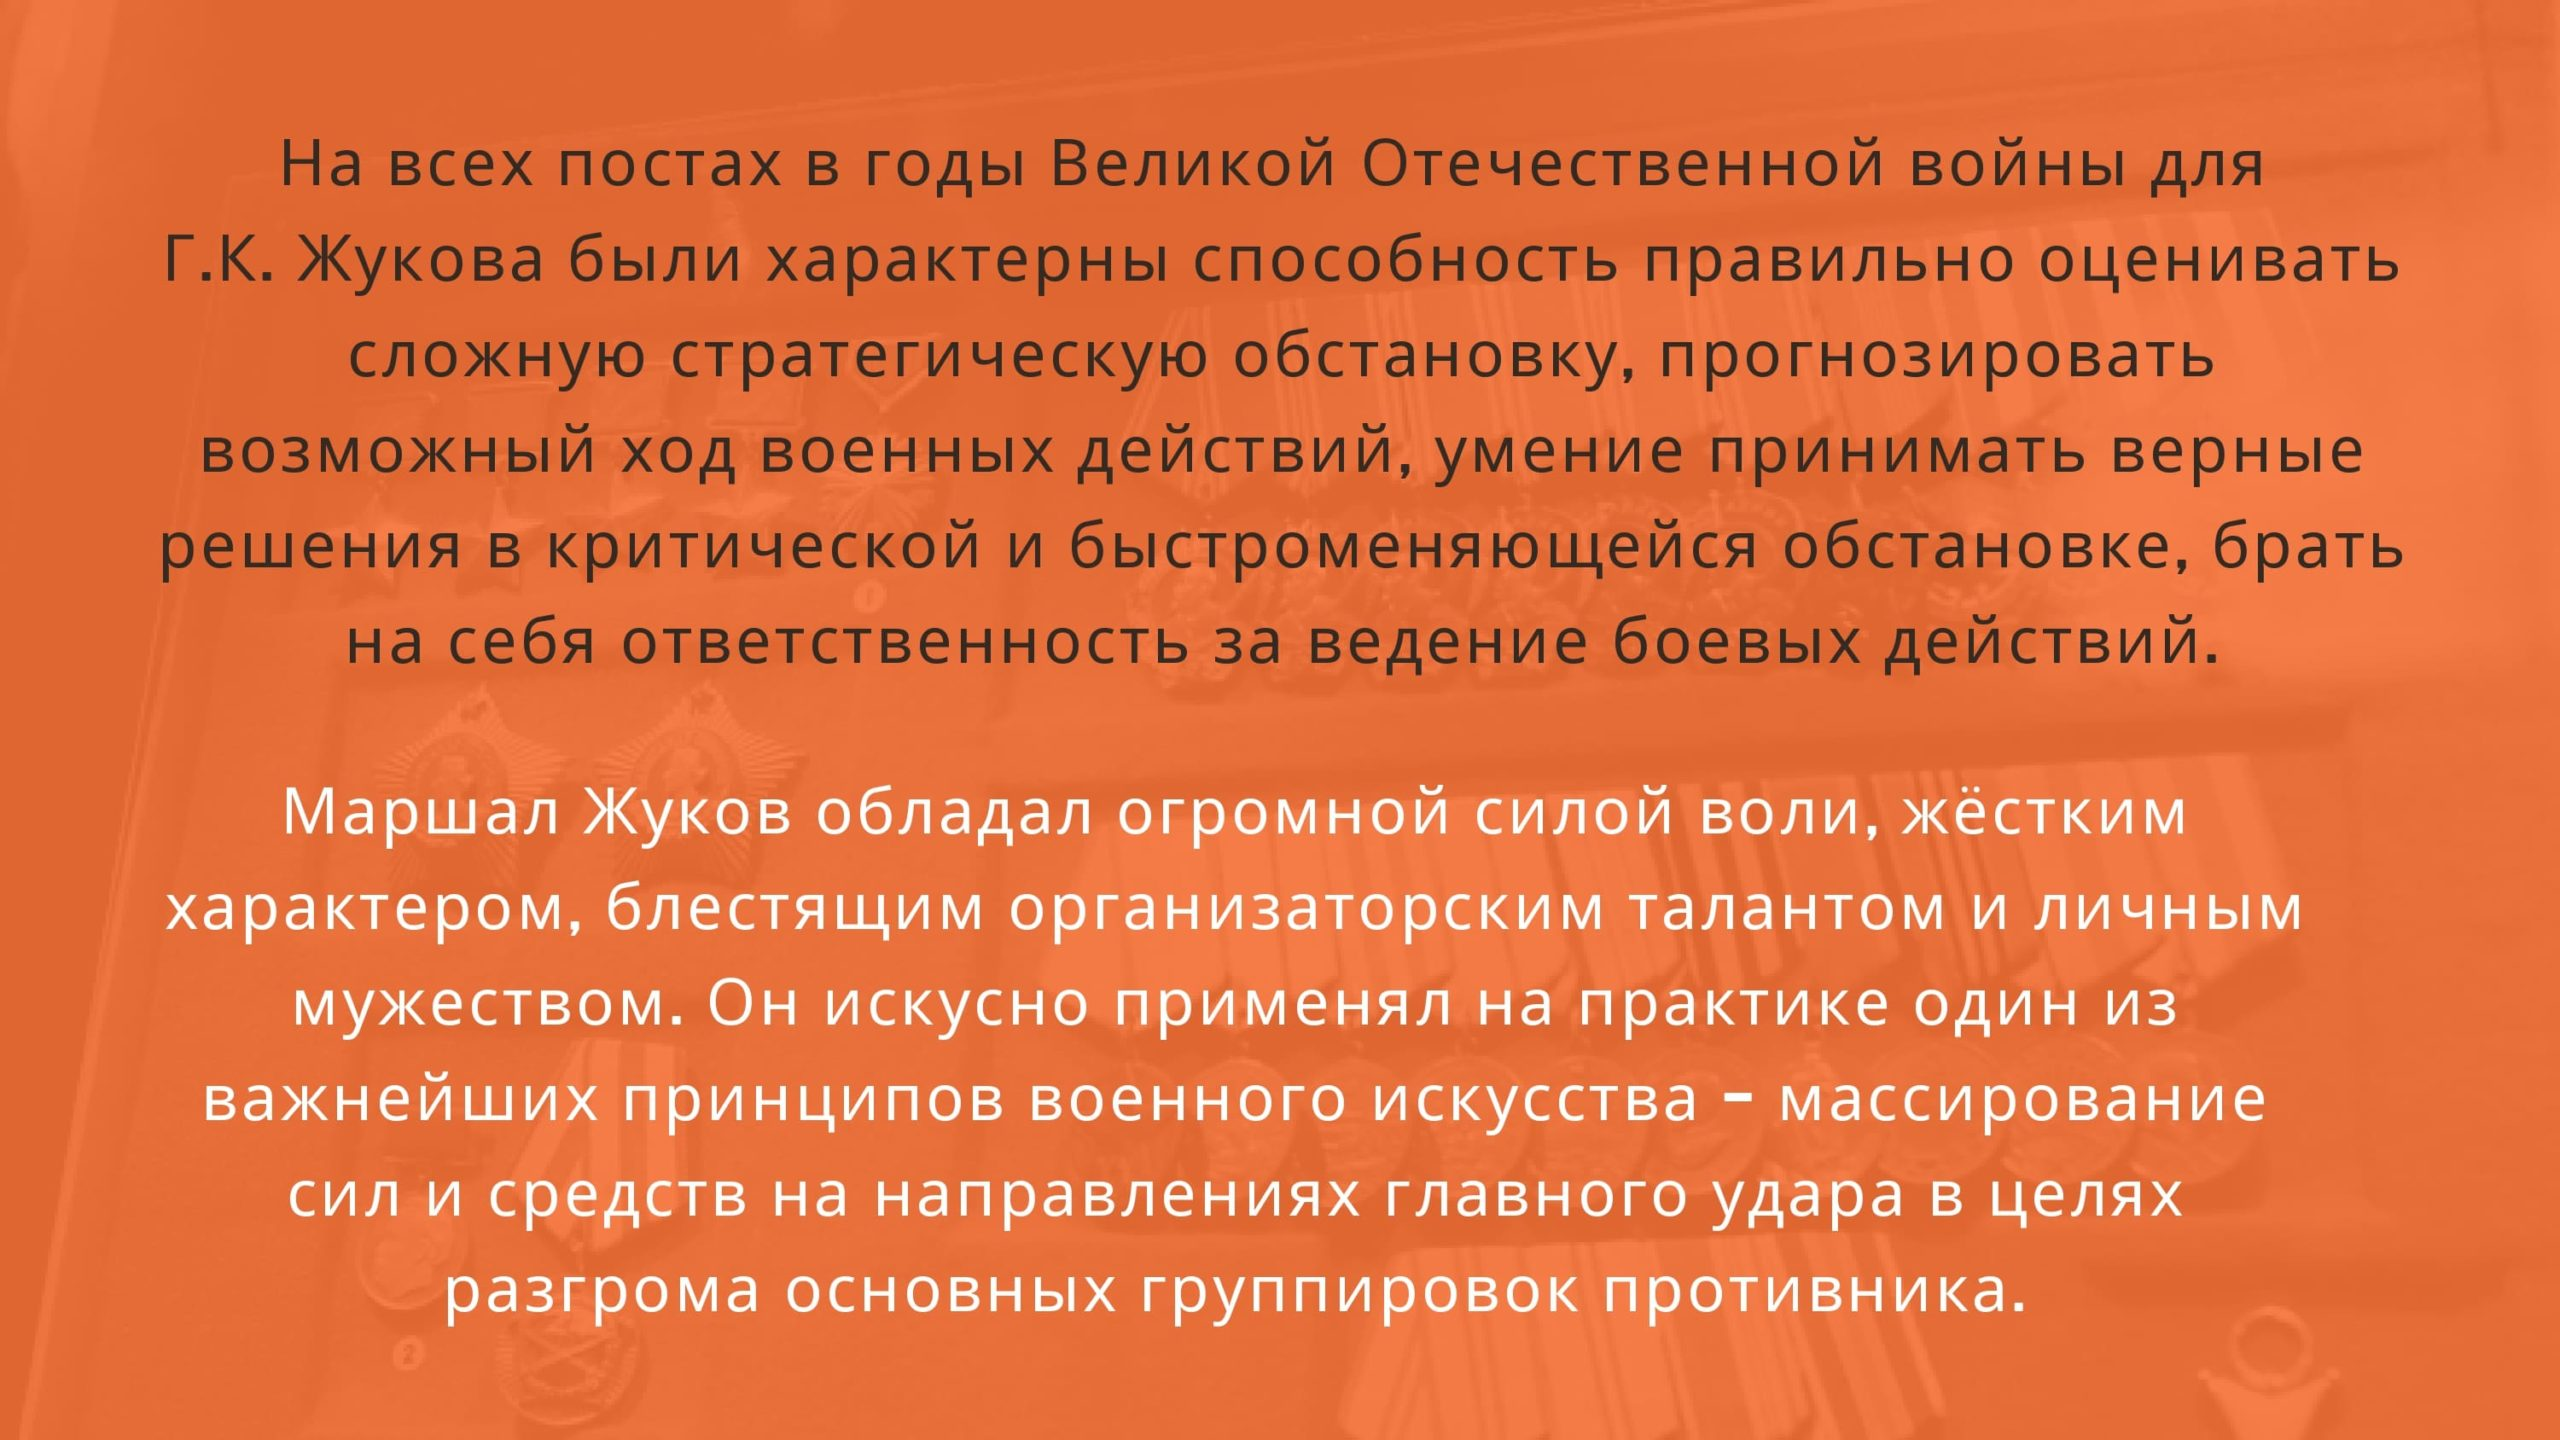 Георгий Константинович Жуков обладал огромной силой воли, жестким характером